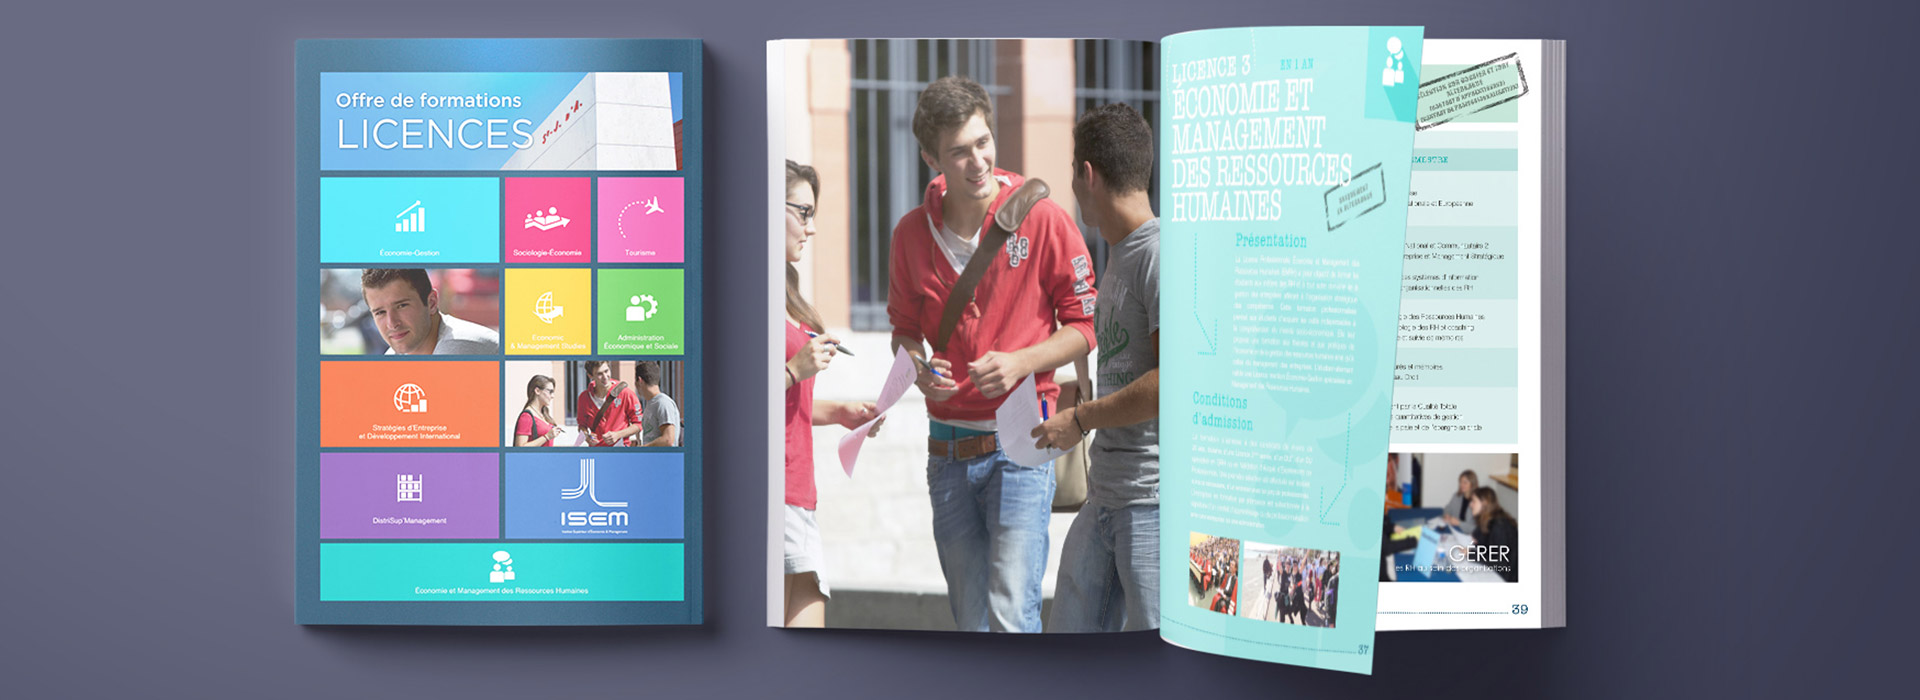 http://brochure-formations-licences-isem-web